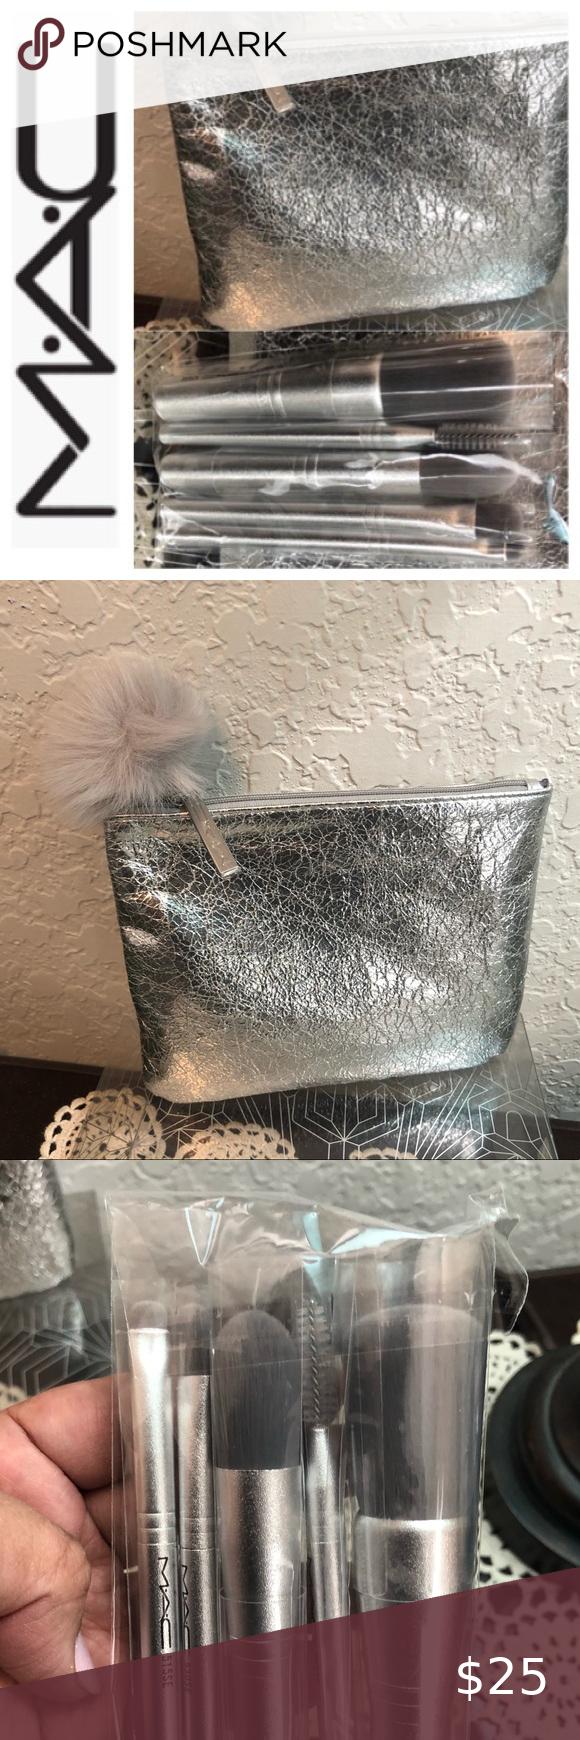 SOLD 🎉M•A•C SNOWBALL BRUSH KIT ️ in 2020 Brush kit